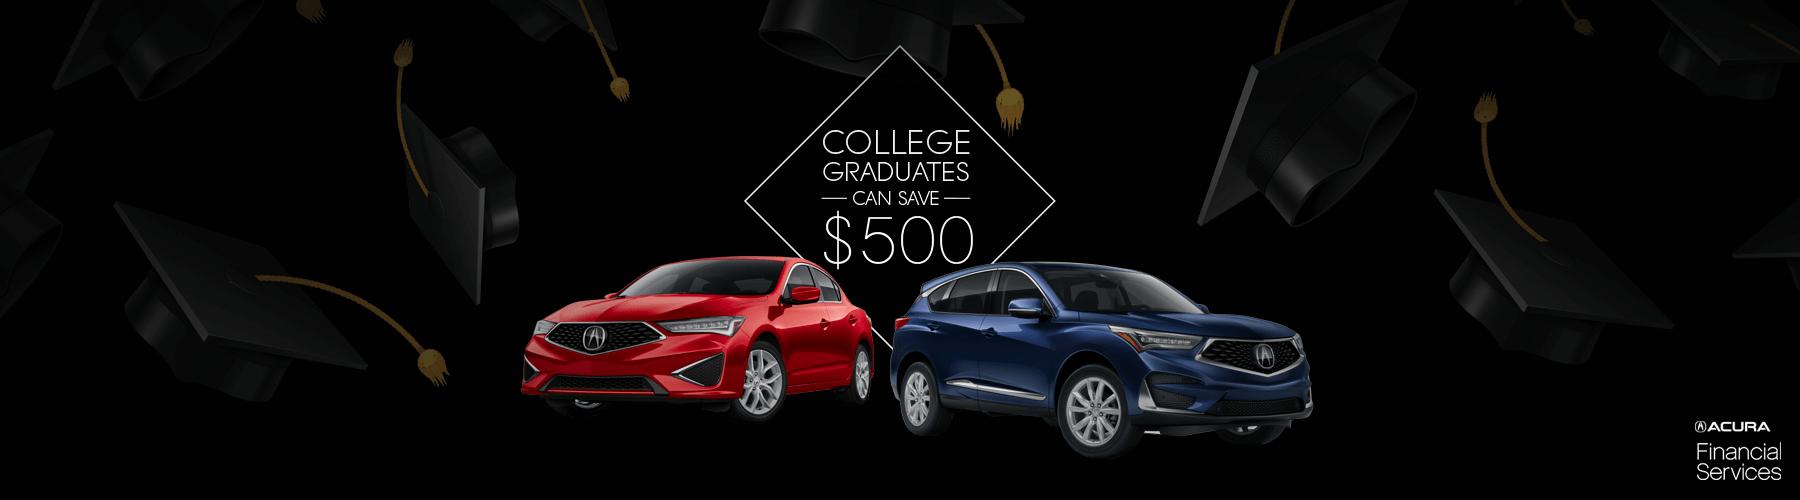 2019 Acura College Graduate Program Slider